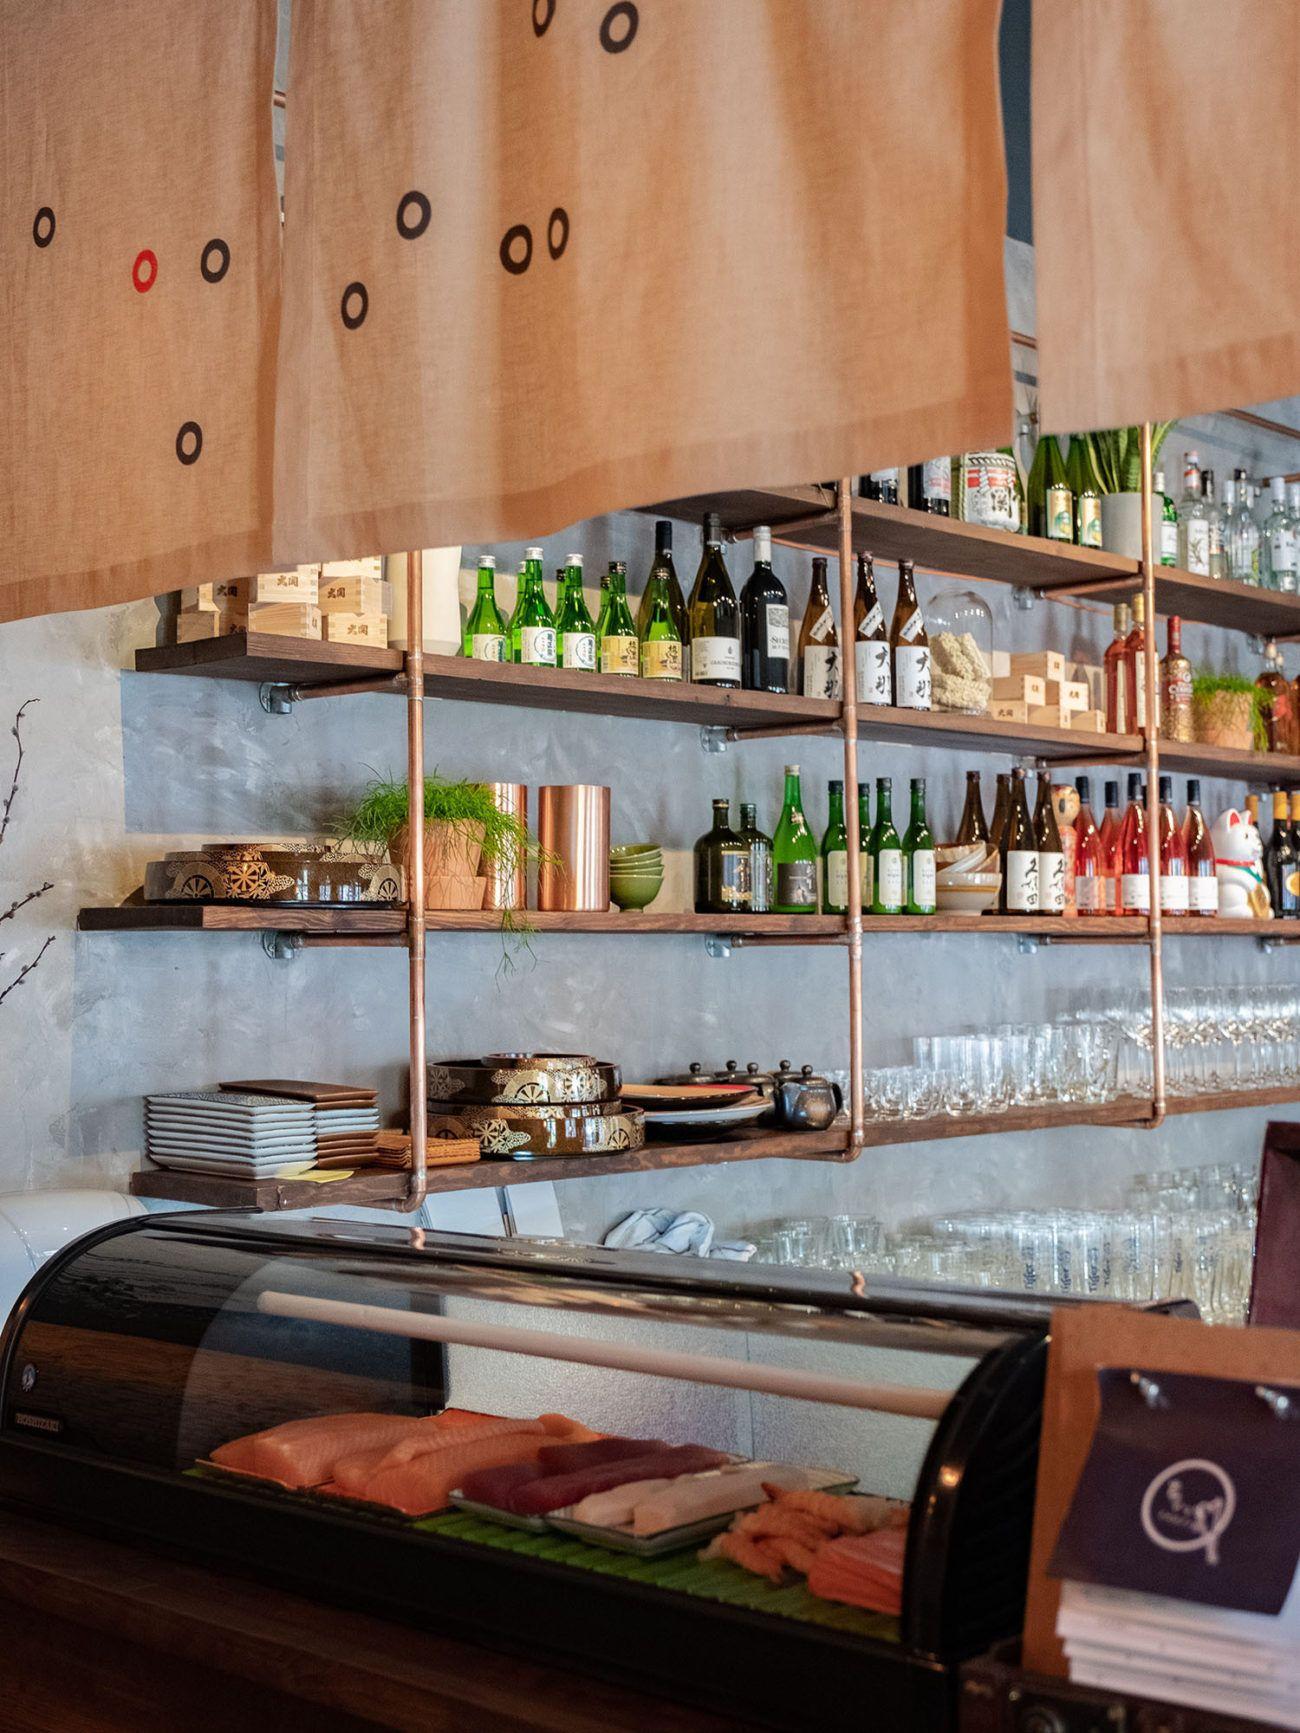 Foodblog About Fuel, Restaurant CHOTTO Berlin, Counter, Bar, Sake